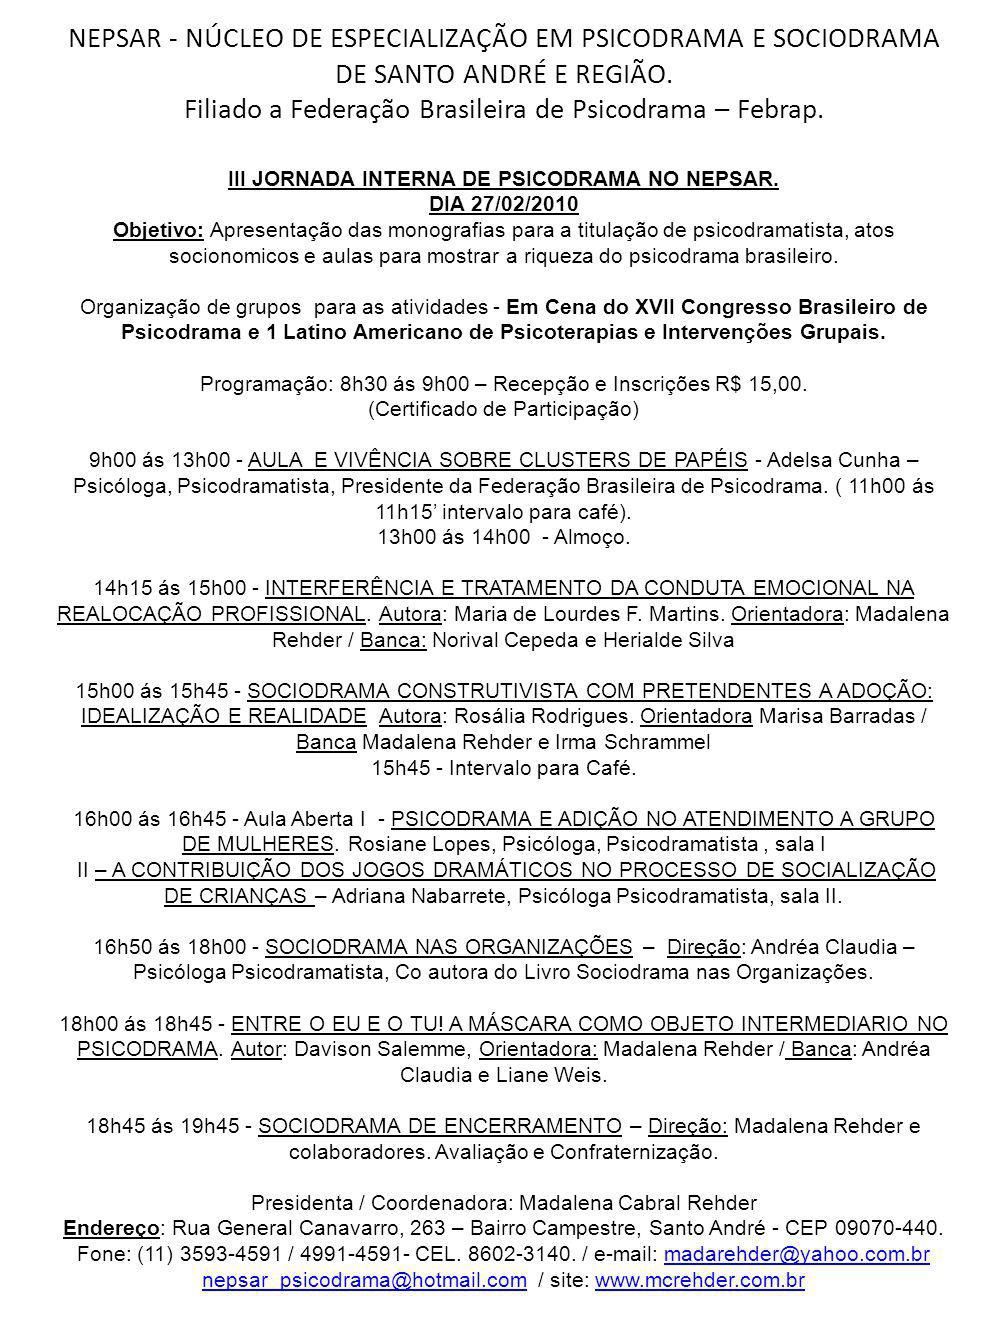 III JORNADA INTERNA DE PSICODRAMA NO NEPSAR.